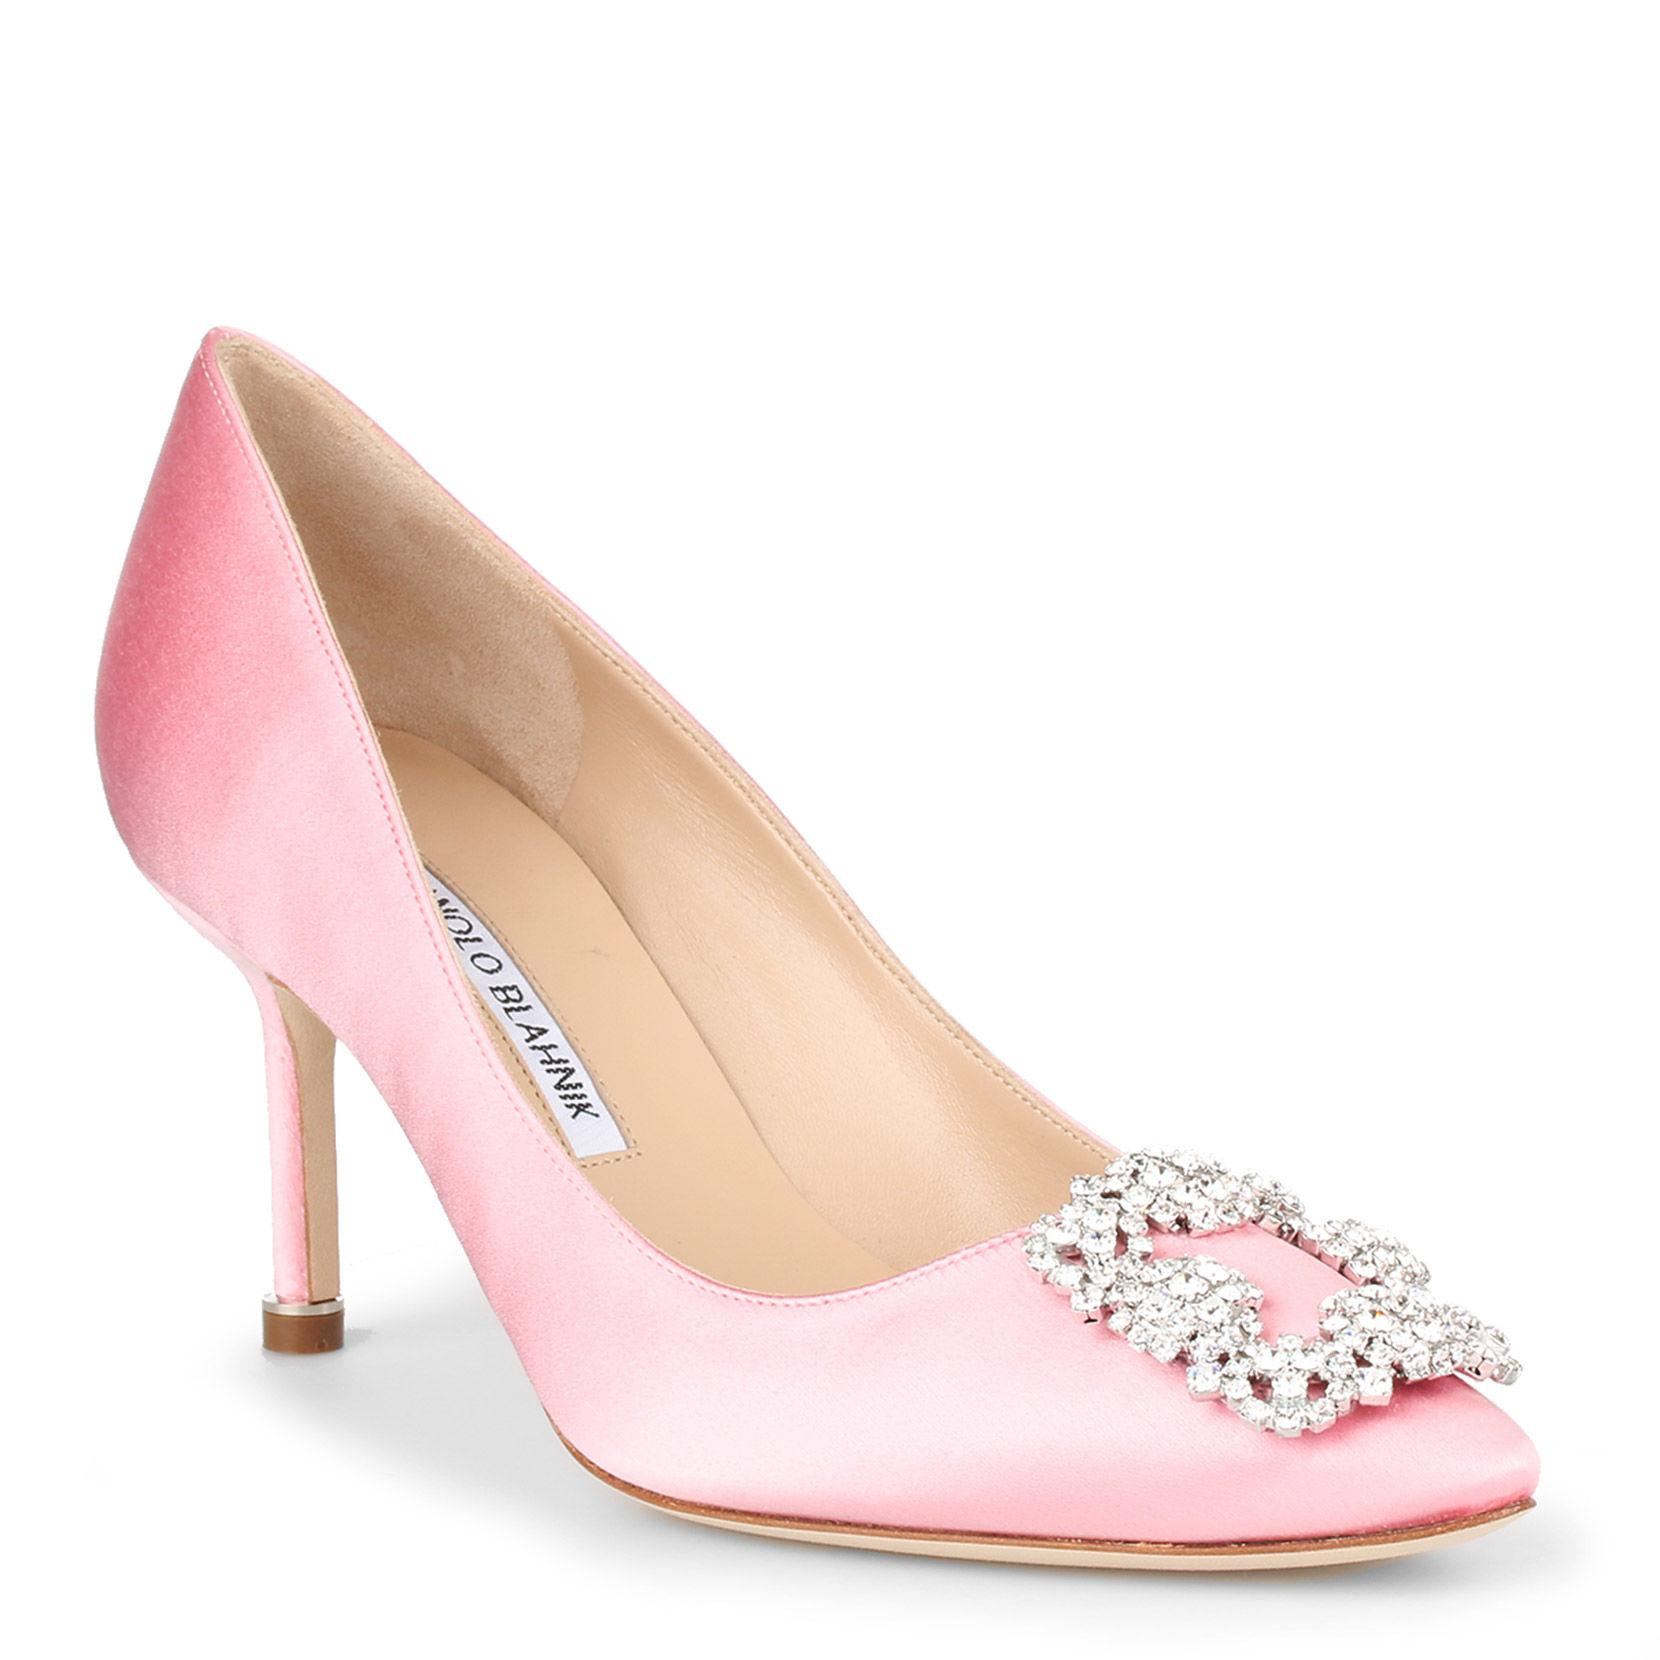 327e86afaa42 Lyst - Manolo Blahnik Hangisi 70 Satin Pump Light Pink in Pink - Save 3%